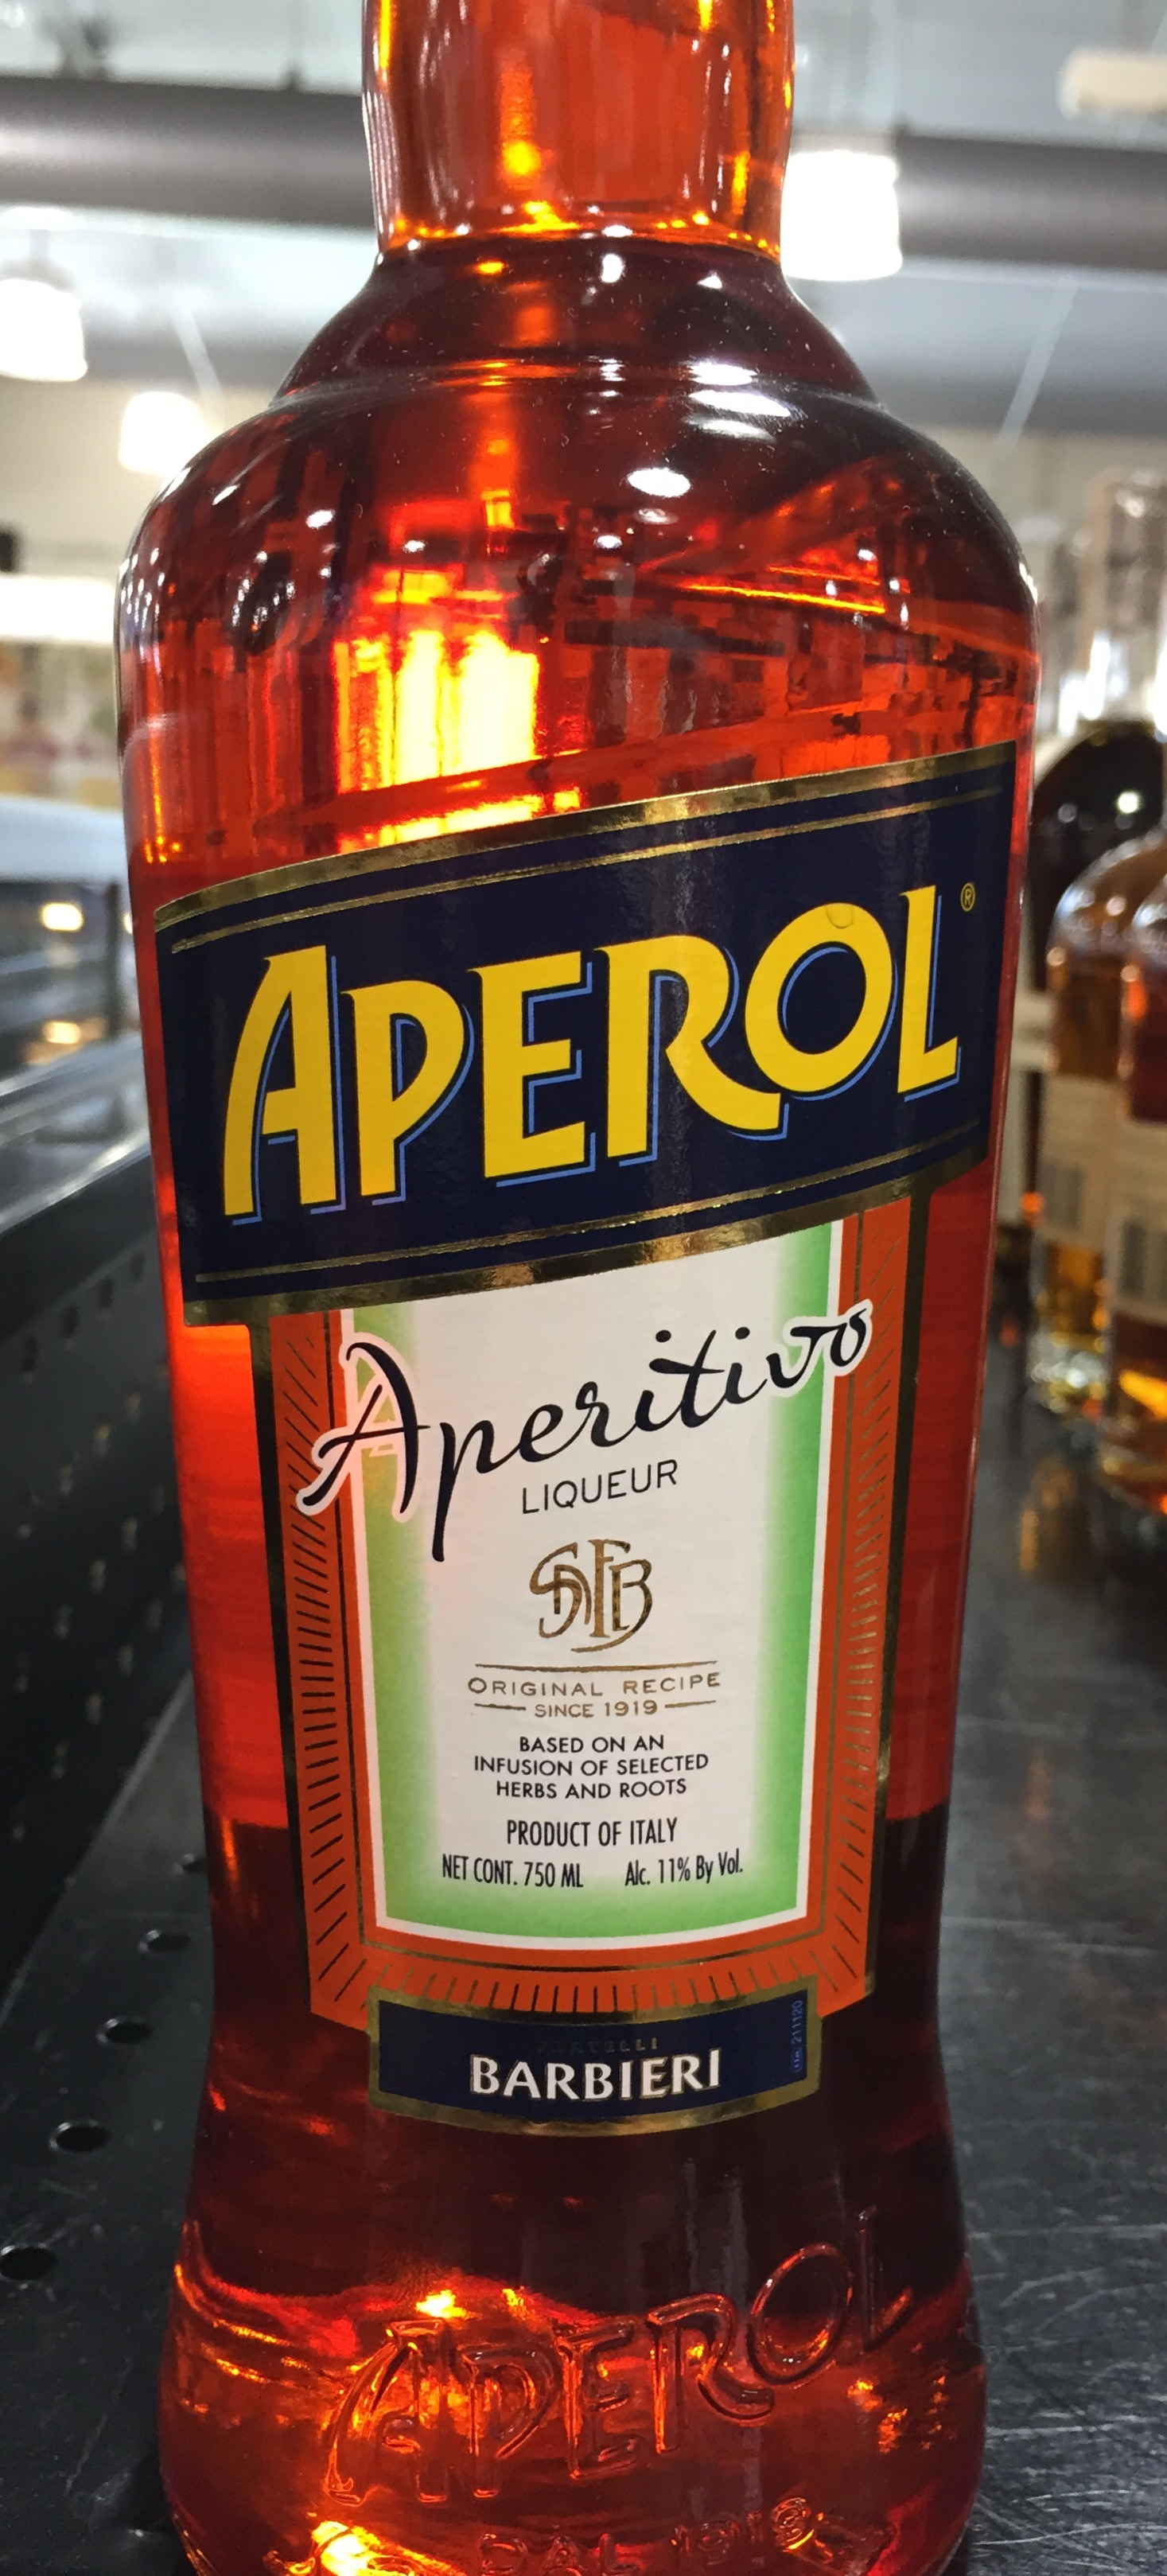 ... Italian Summer Refresher - The Aperol Spritz - Wine Adventure Journal